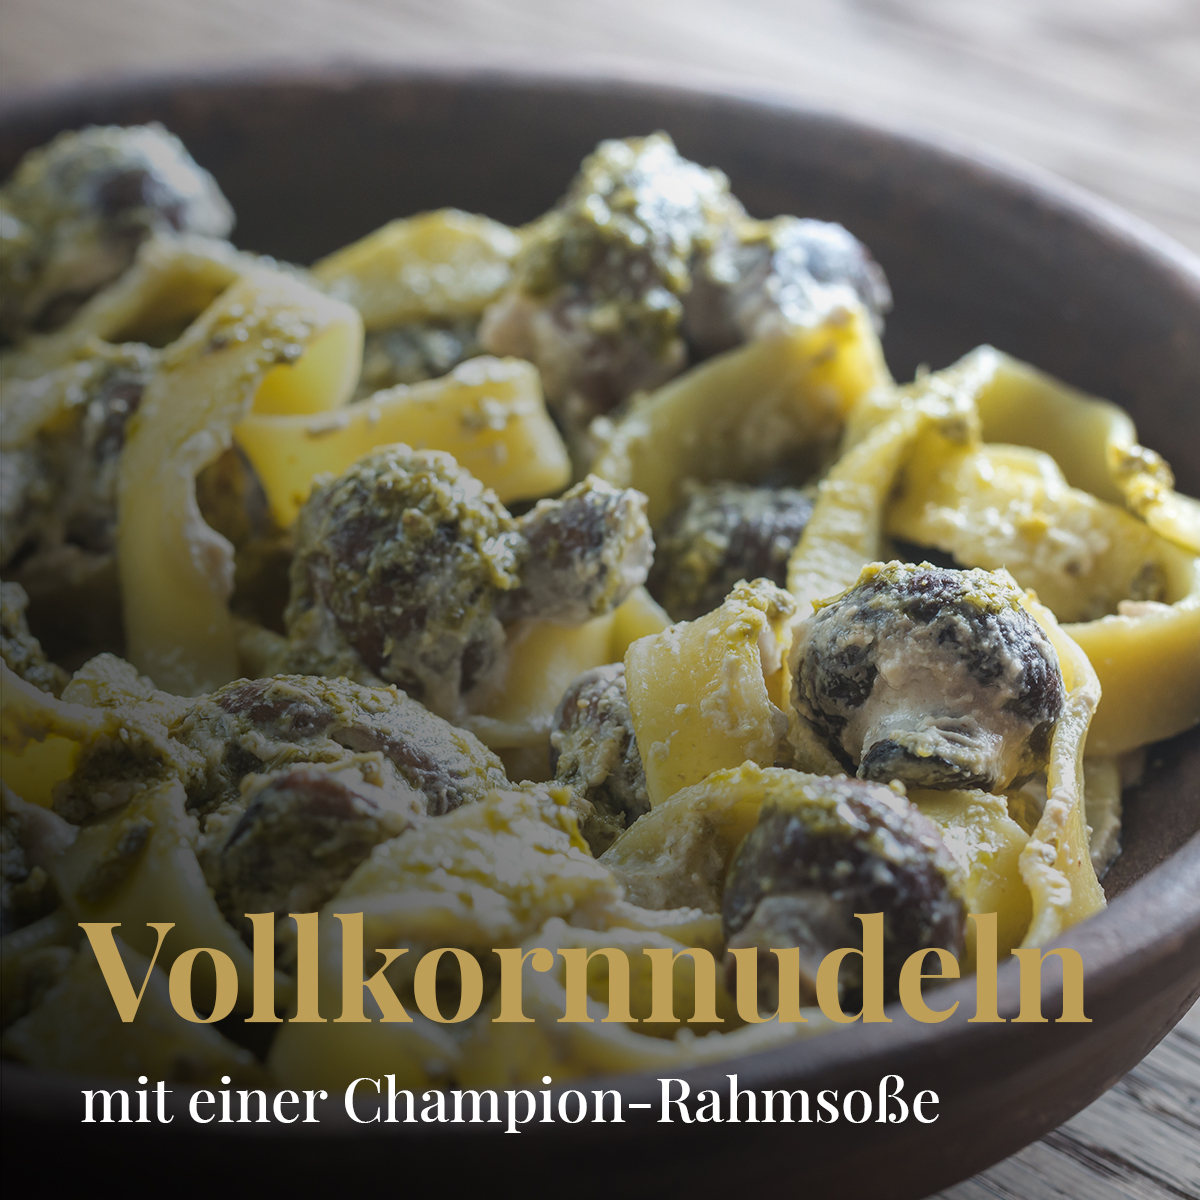 Rezeptvorschlag - Weingut Hubertushof Lieser